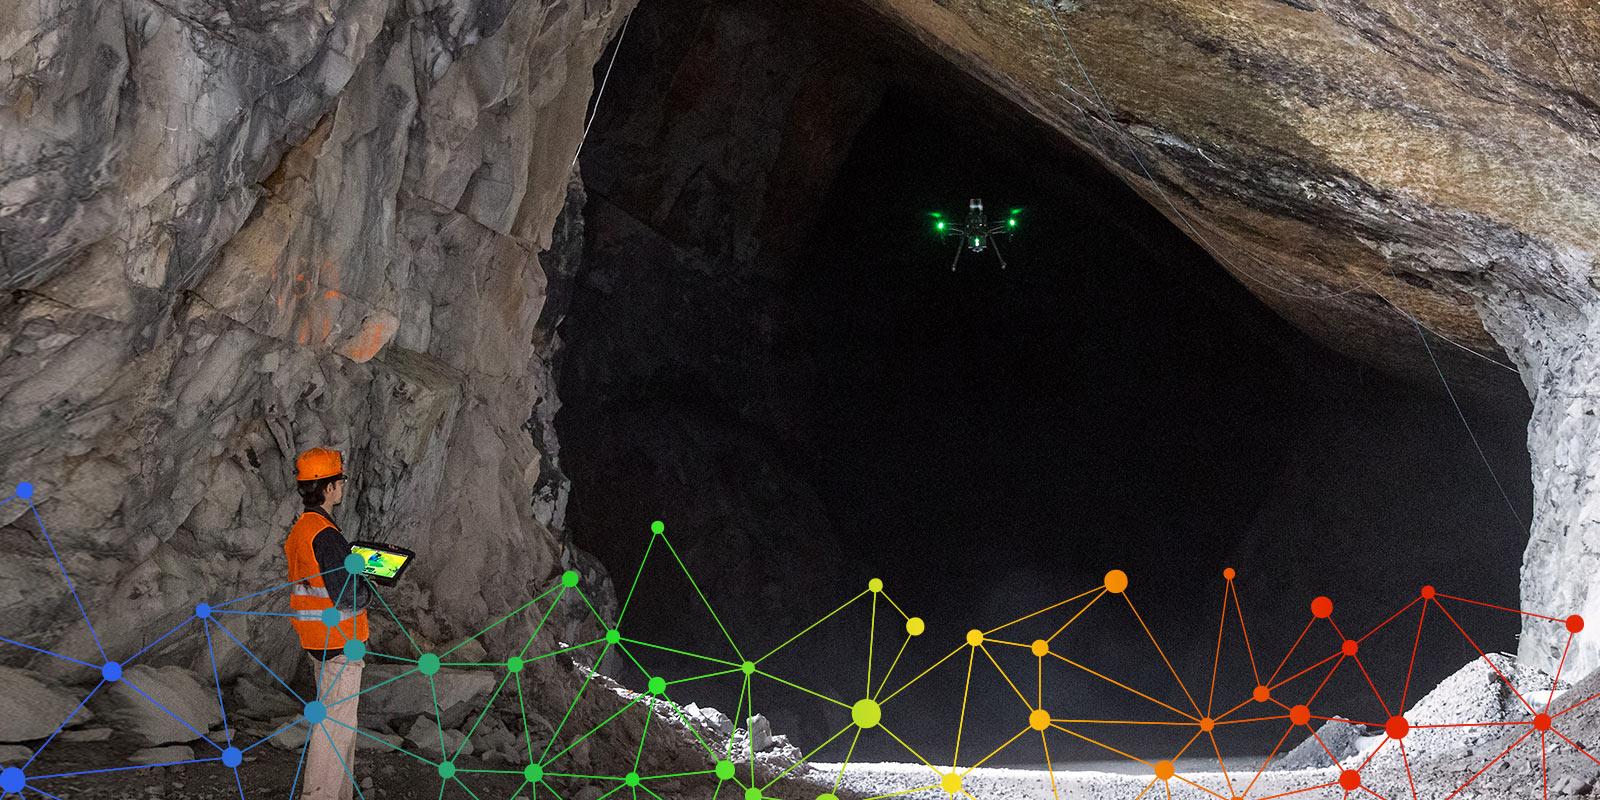 MINELiDAR Hovermap Drone Mounted LiDAR scanning scans mining underground Perth Western Australia